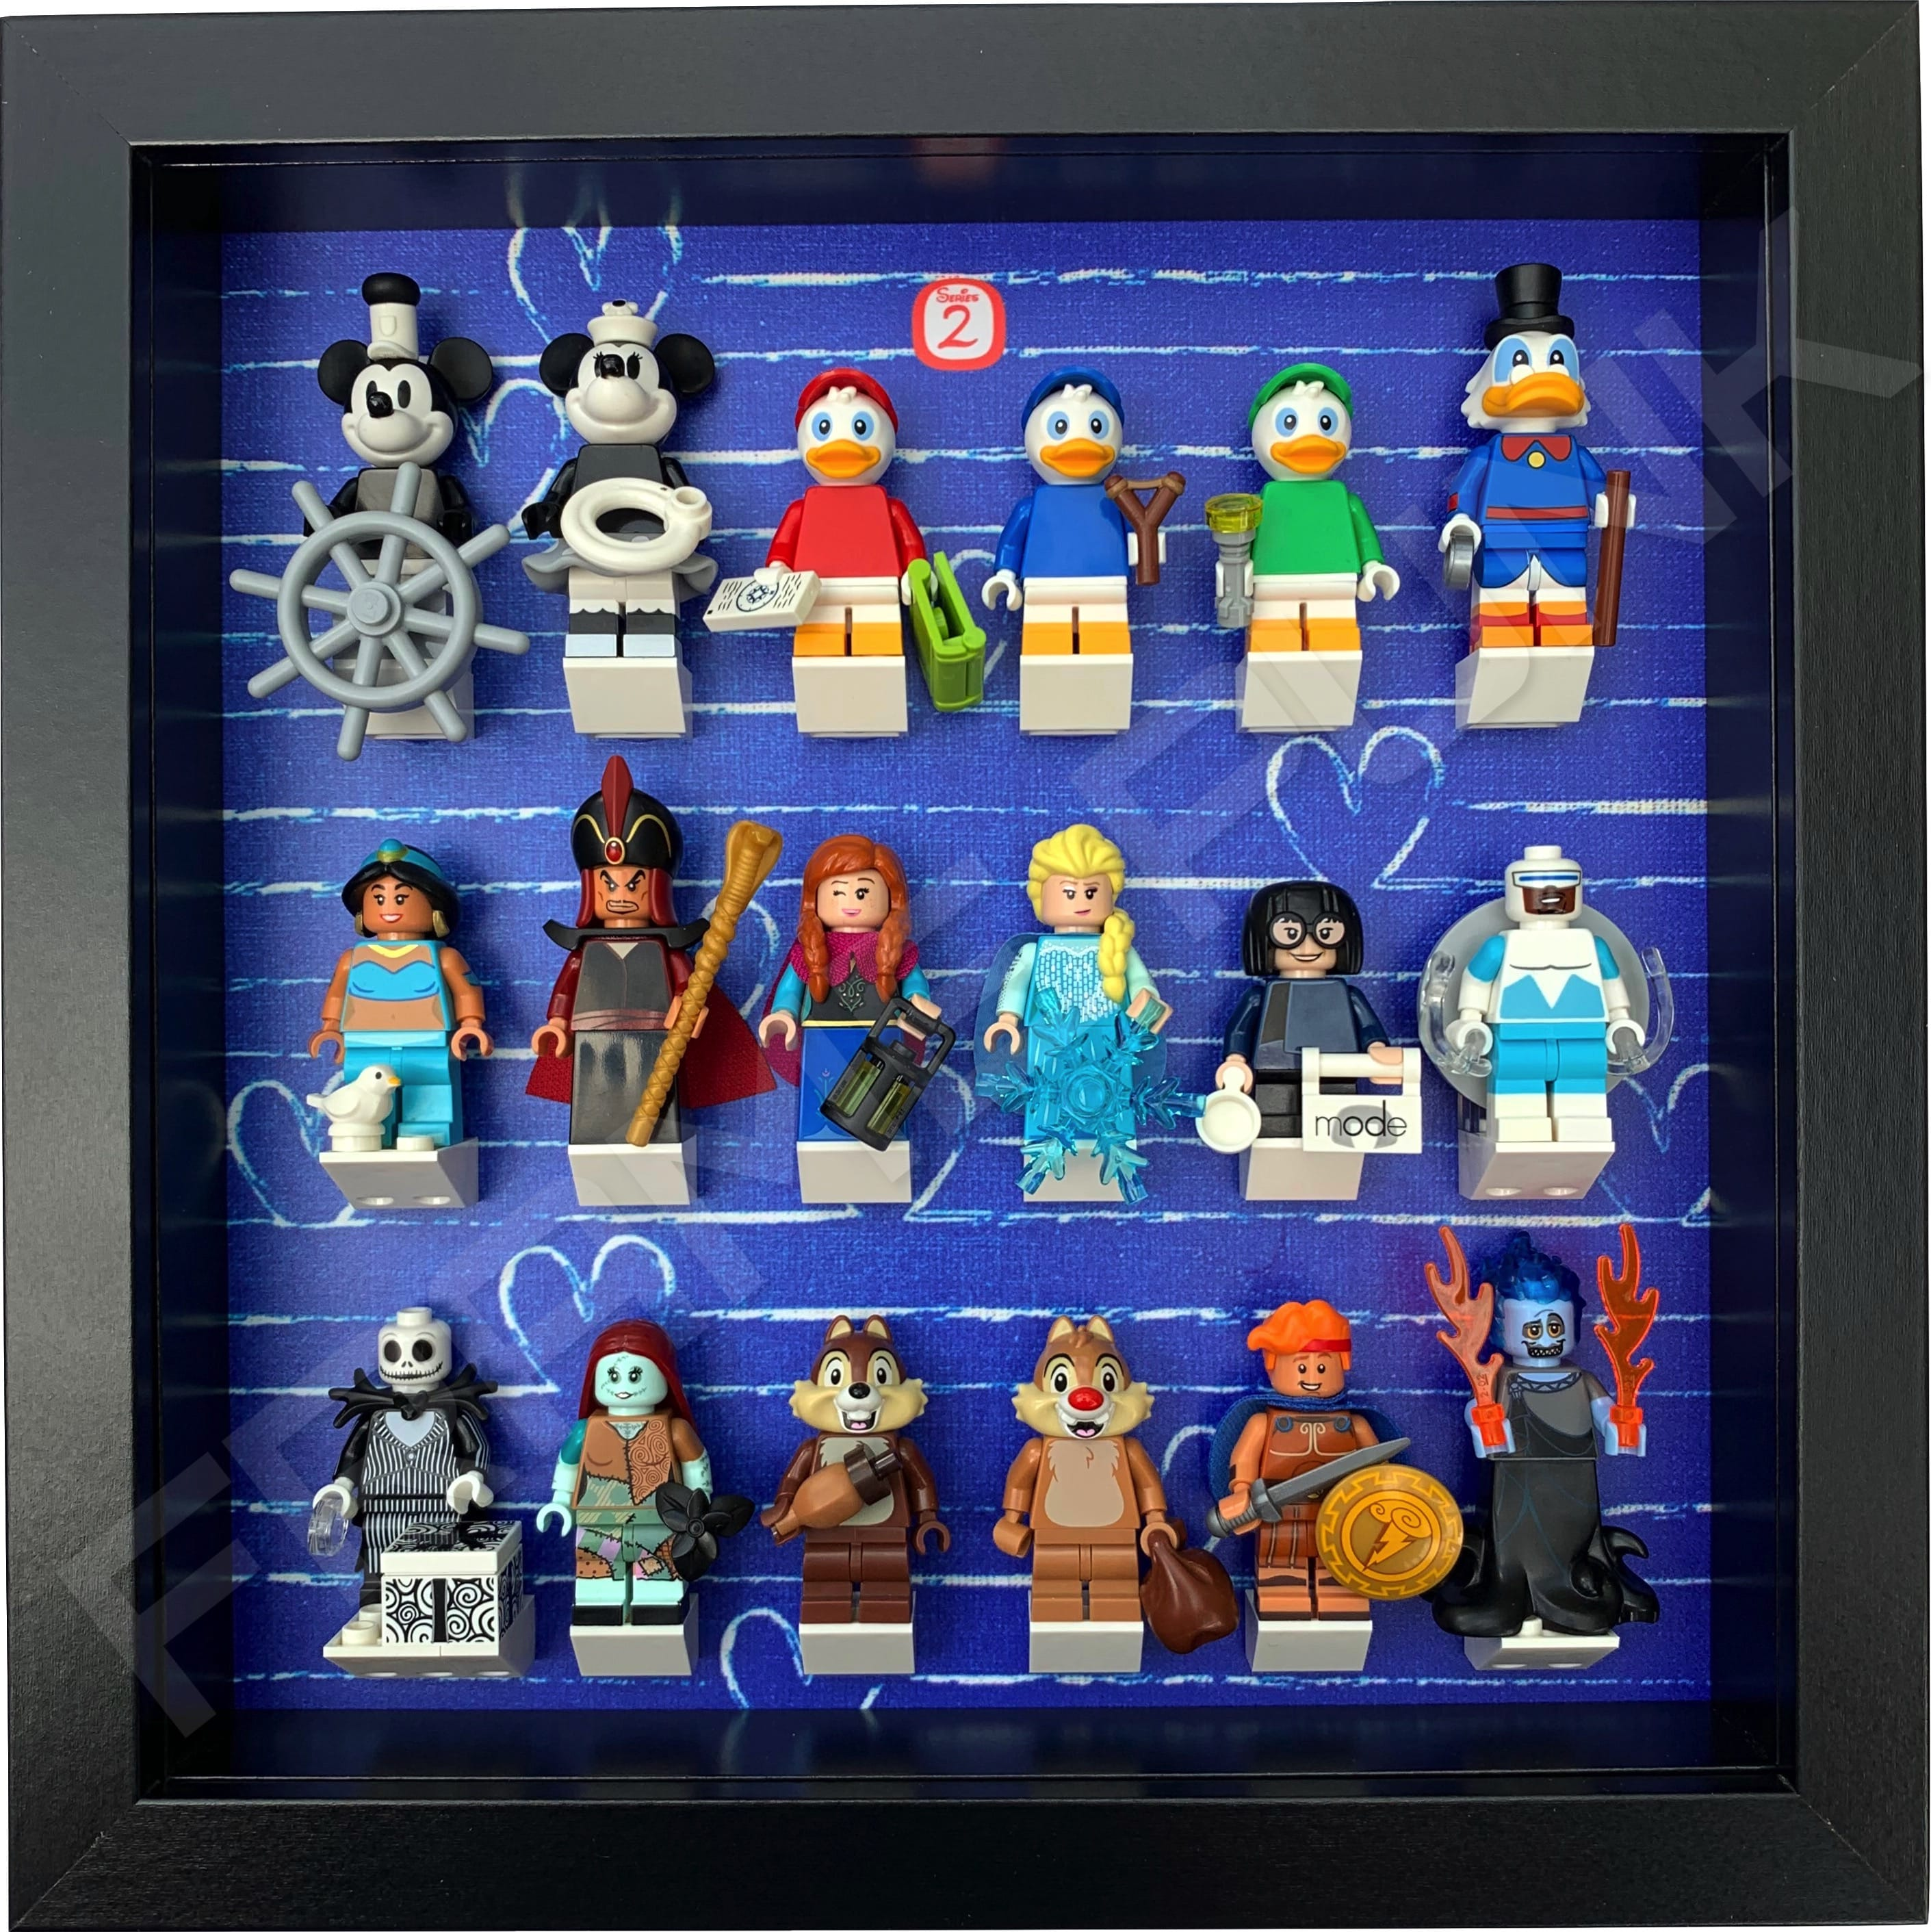 Series 2 Disney Lego Minifigure Display Frame - (HeartBlack)